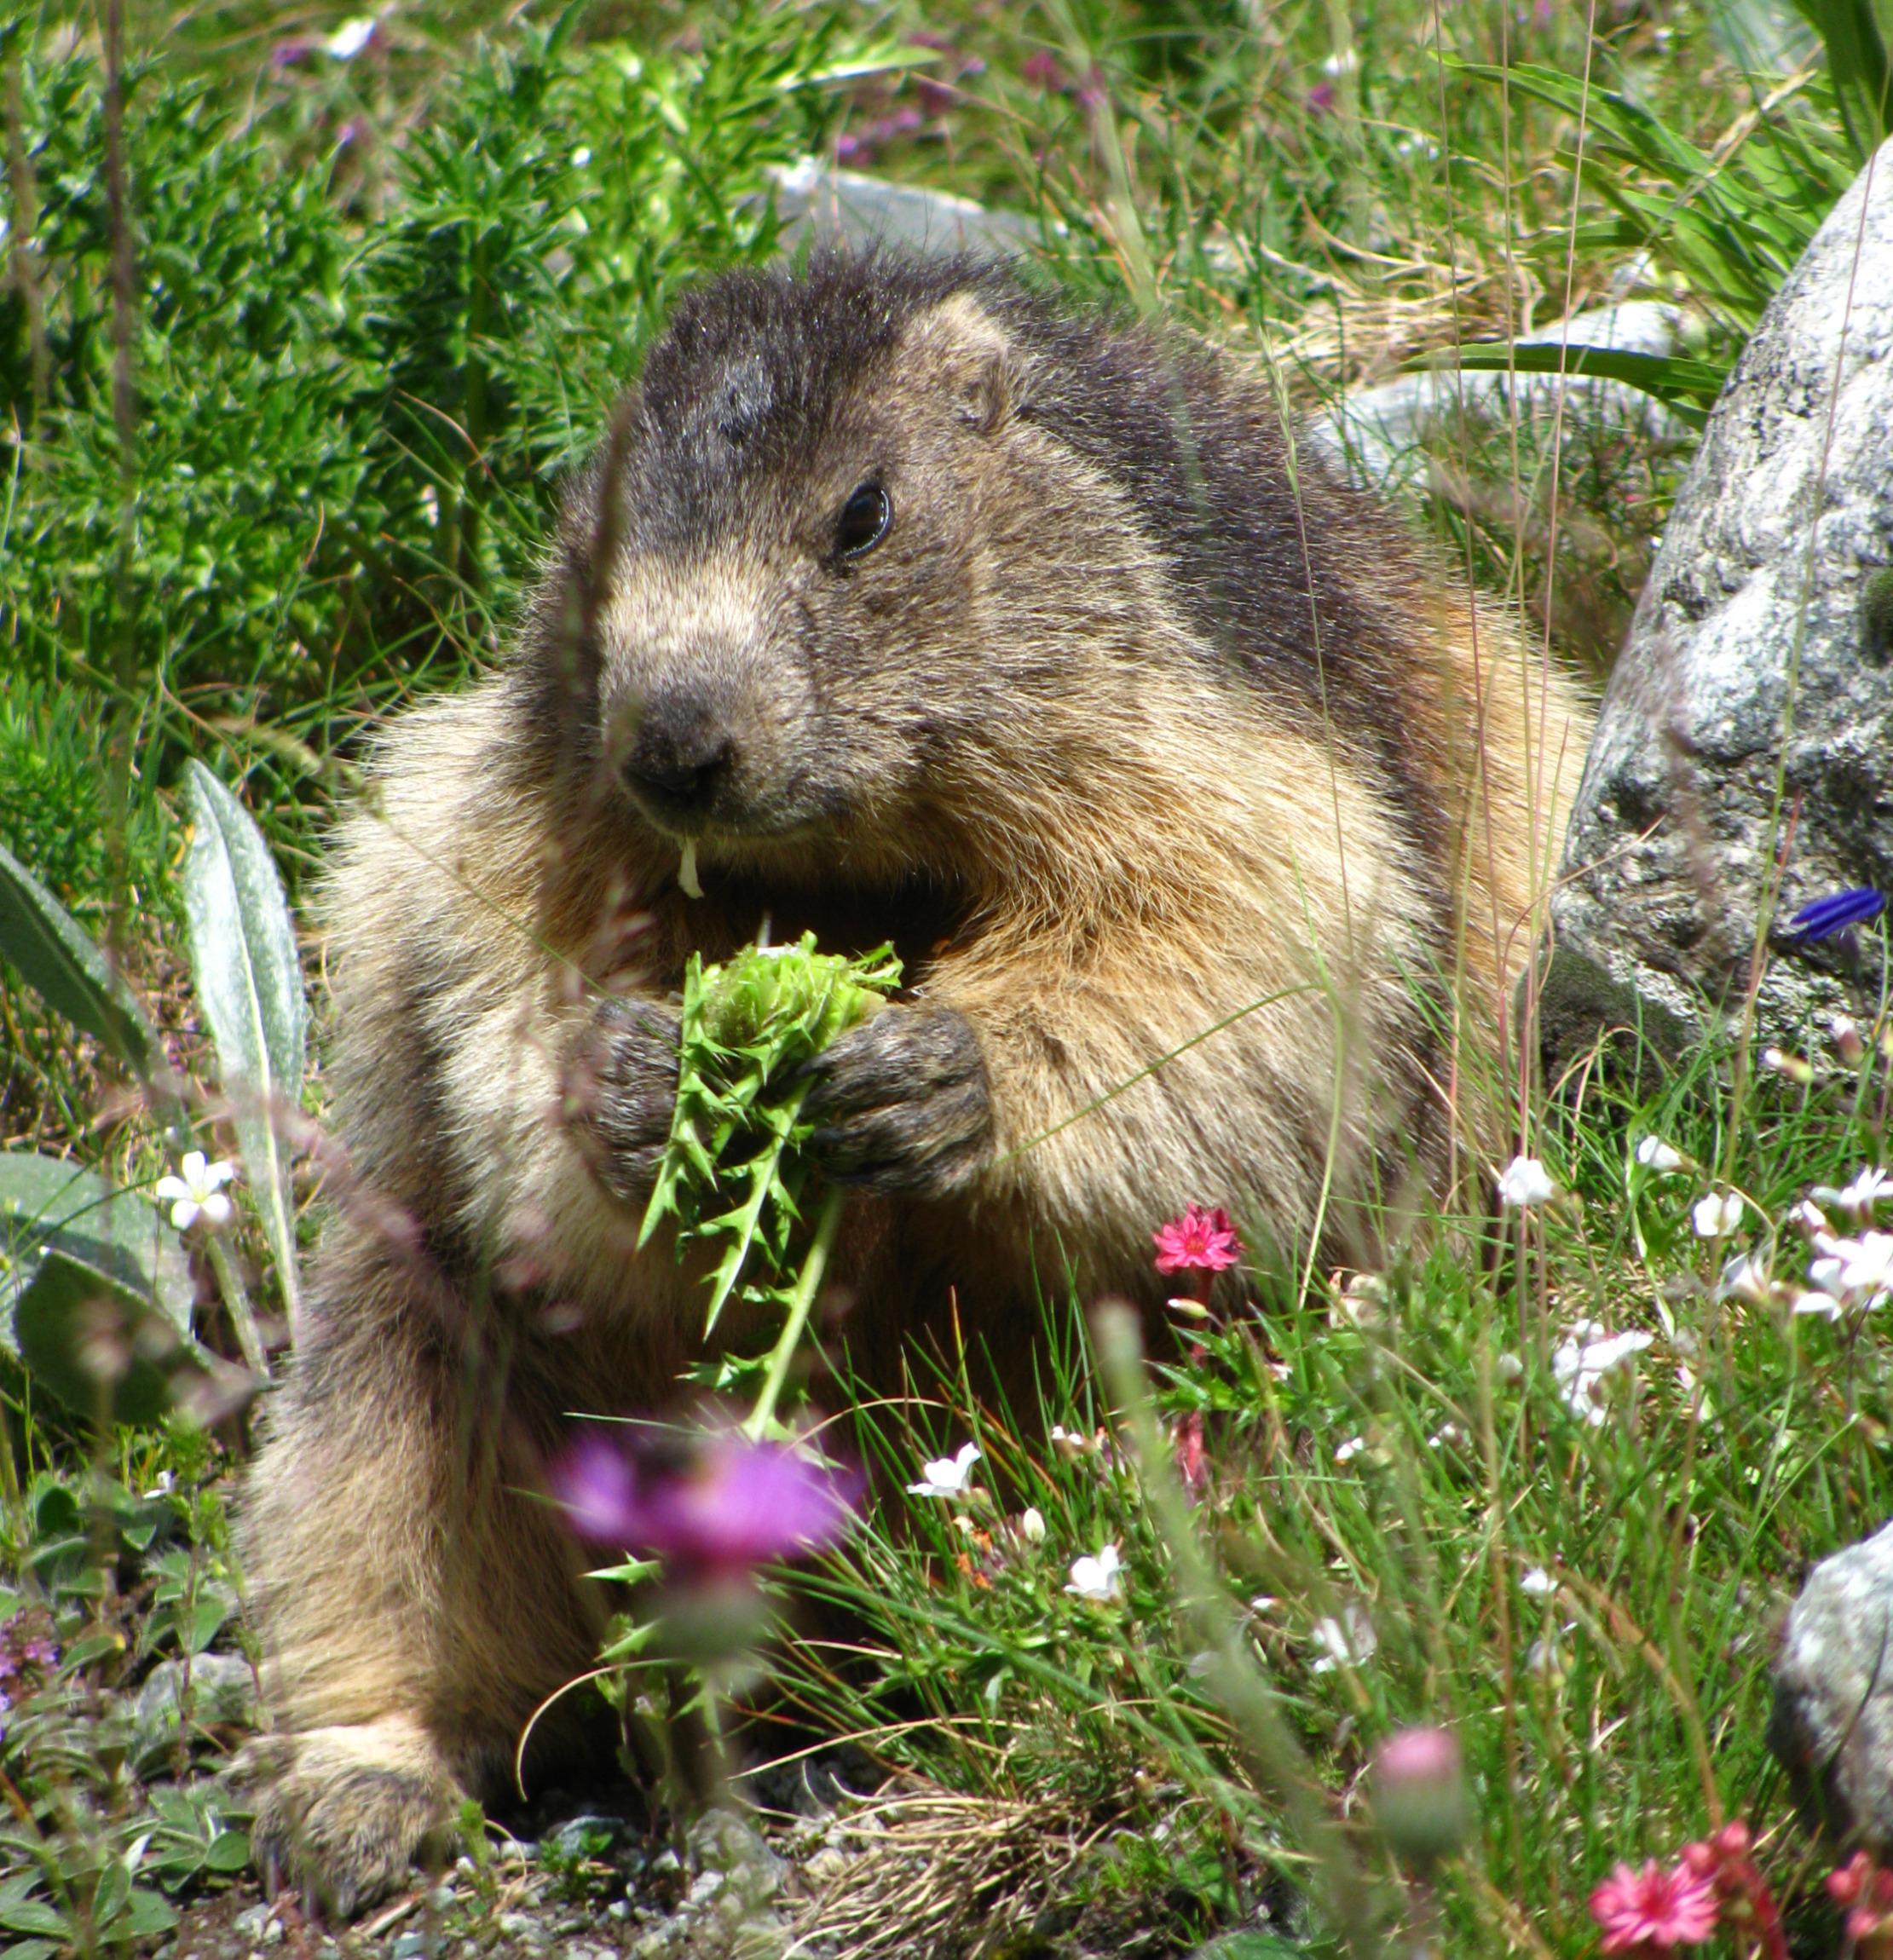 Photo © P. Morillon Horizons - Marmottes